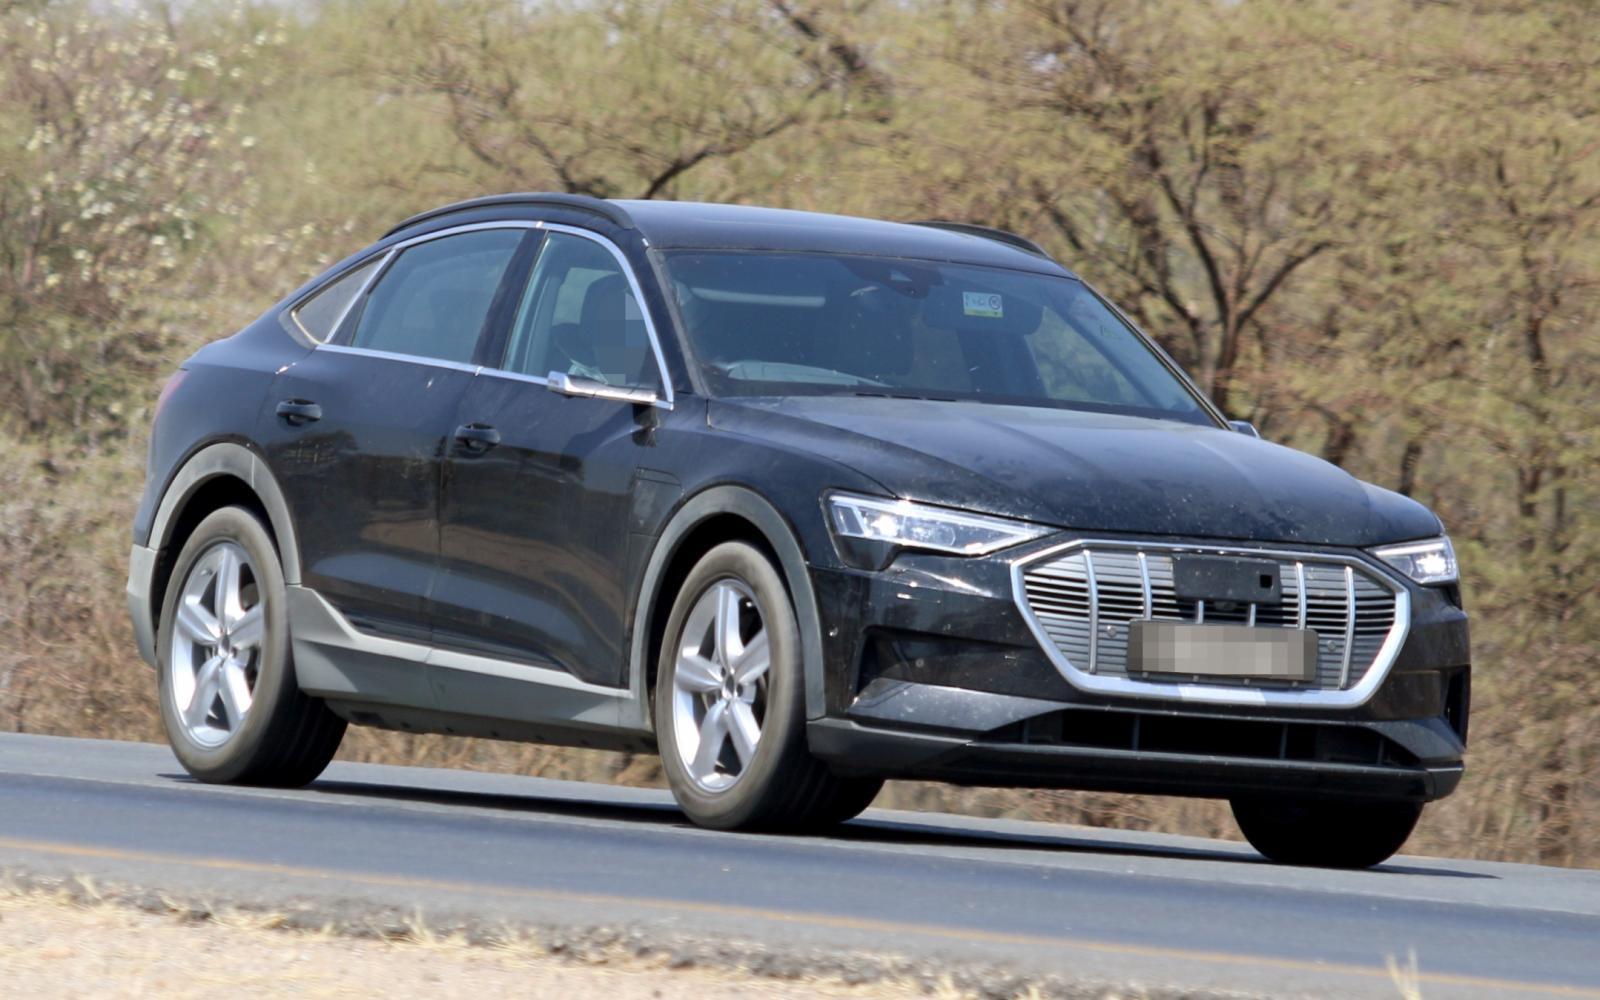 Nu een Audi e-tron kopen of wachten op deze e-tron Sportback?